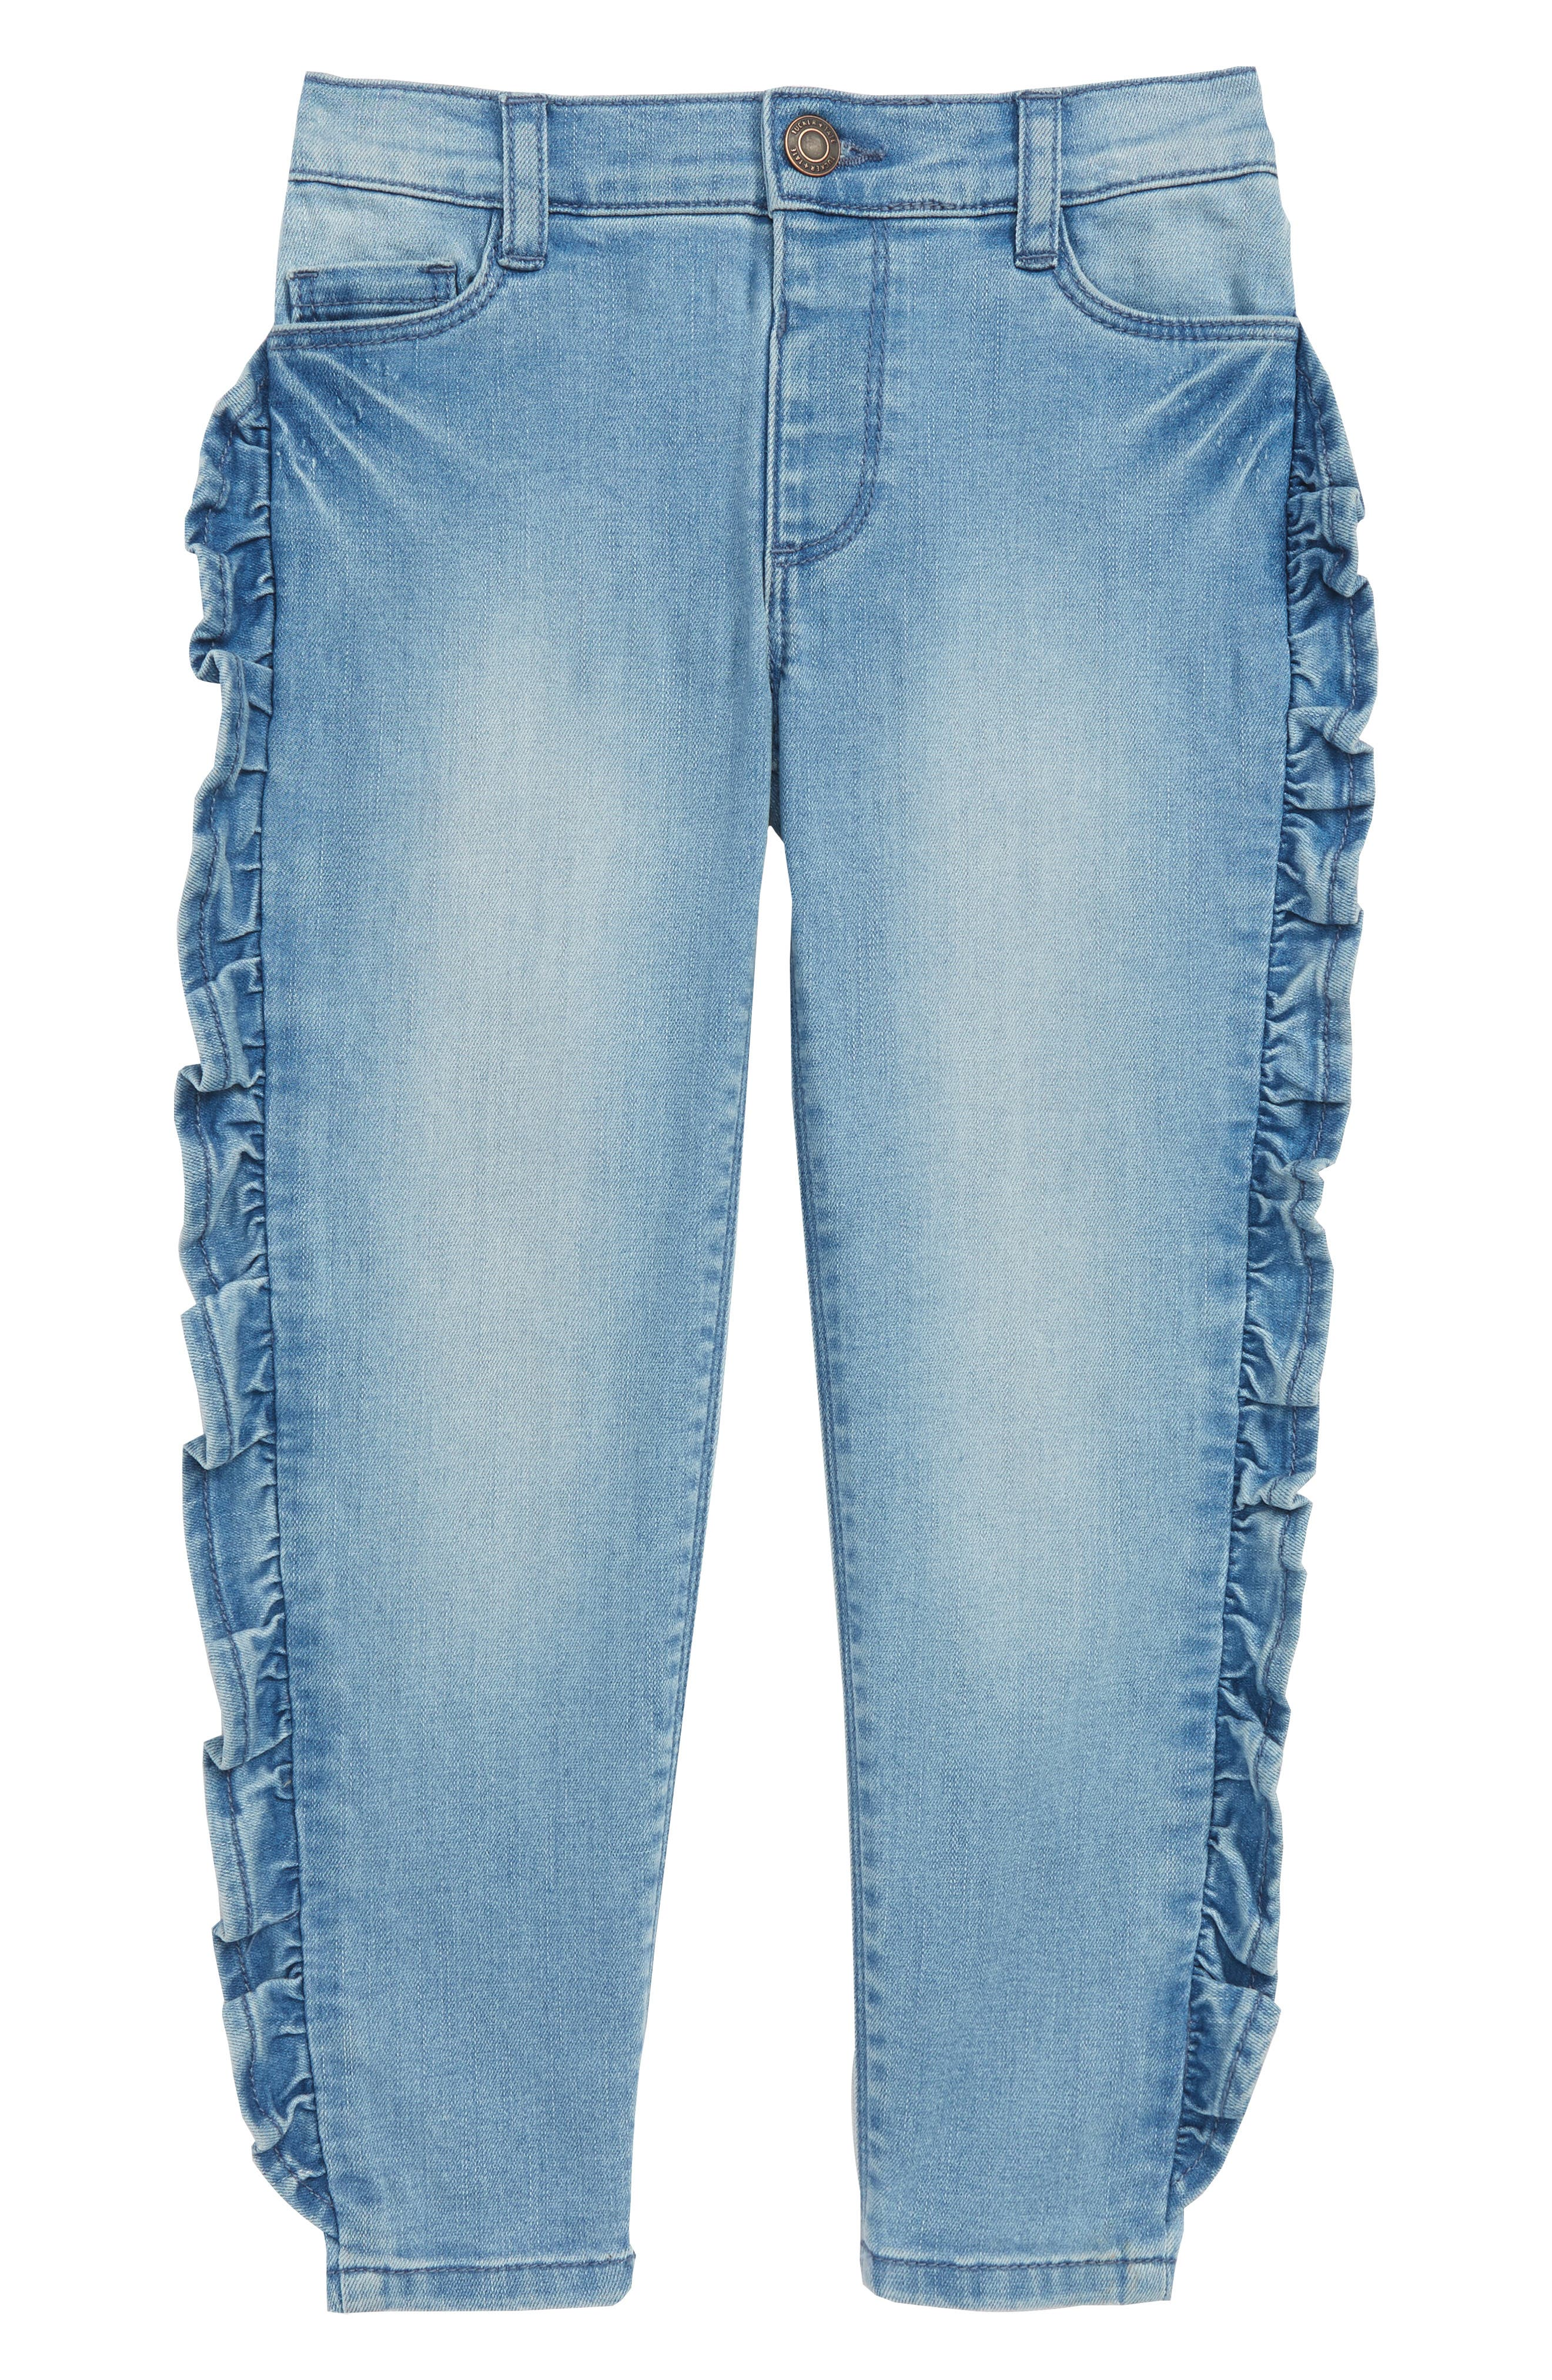 Ruffle Jeans,                         Main,                         color, RUFFLE SKY WASH